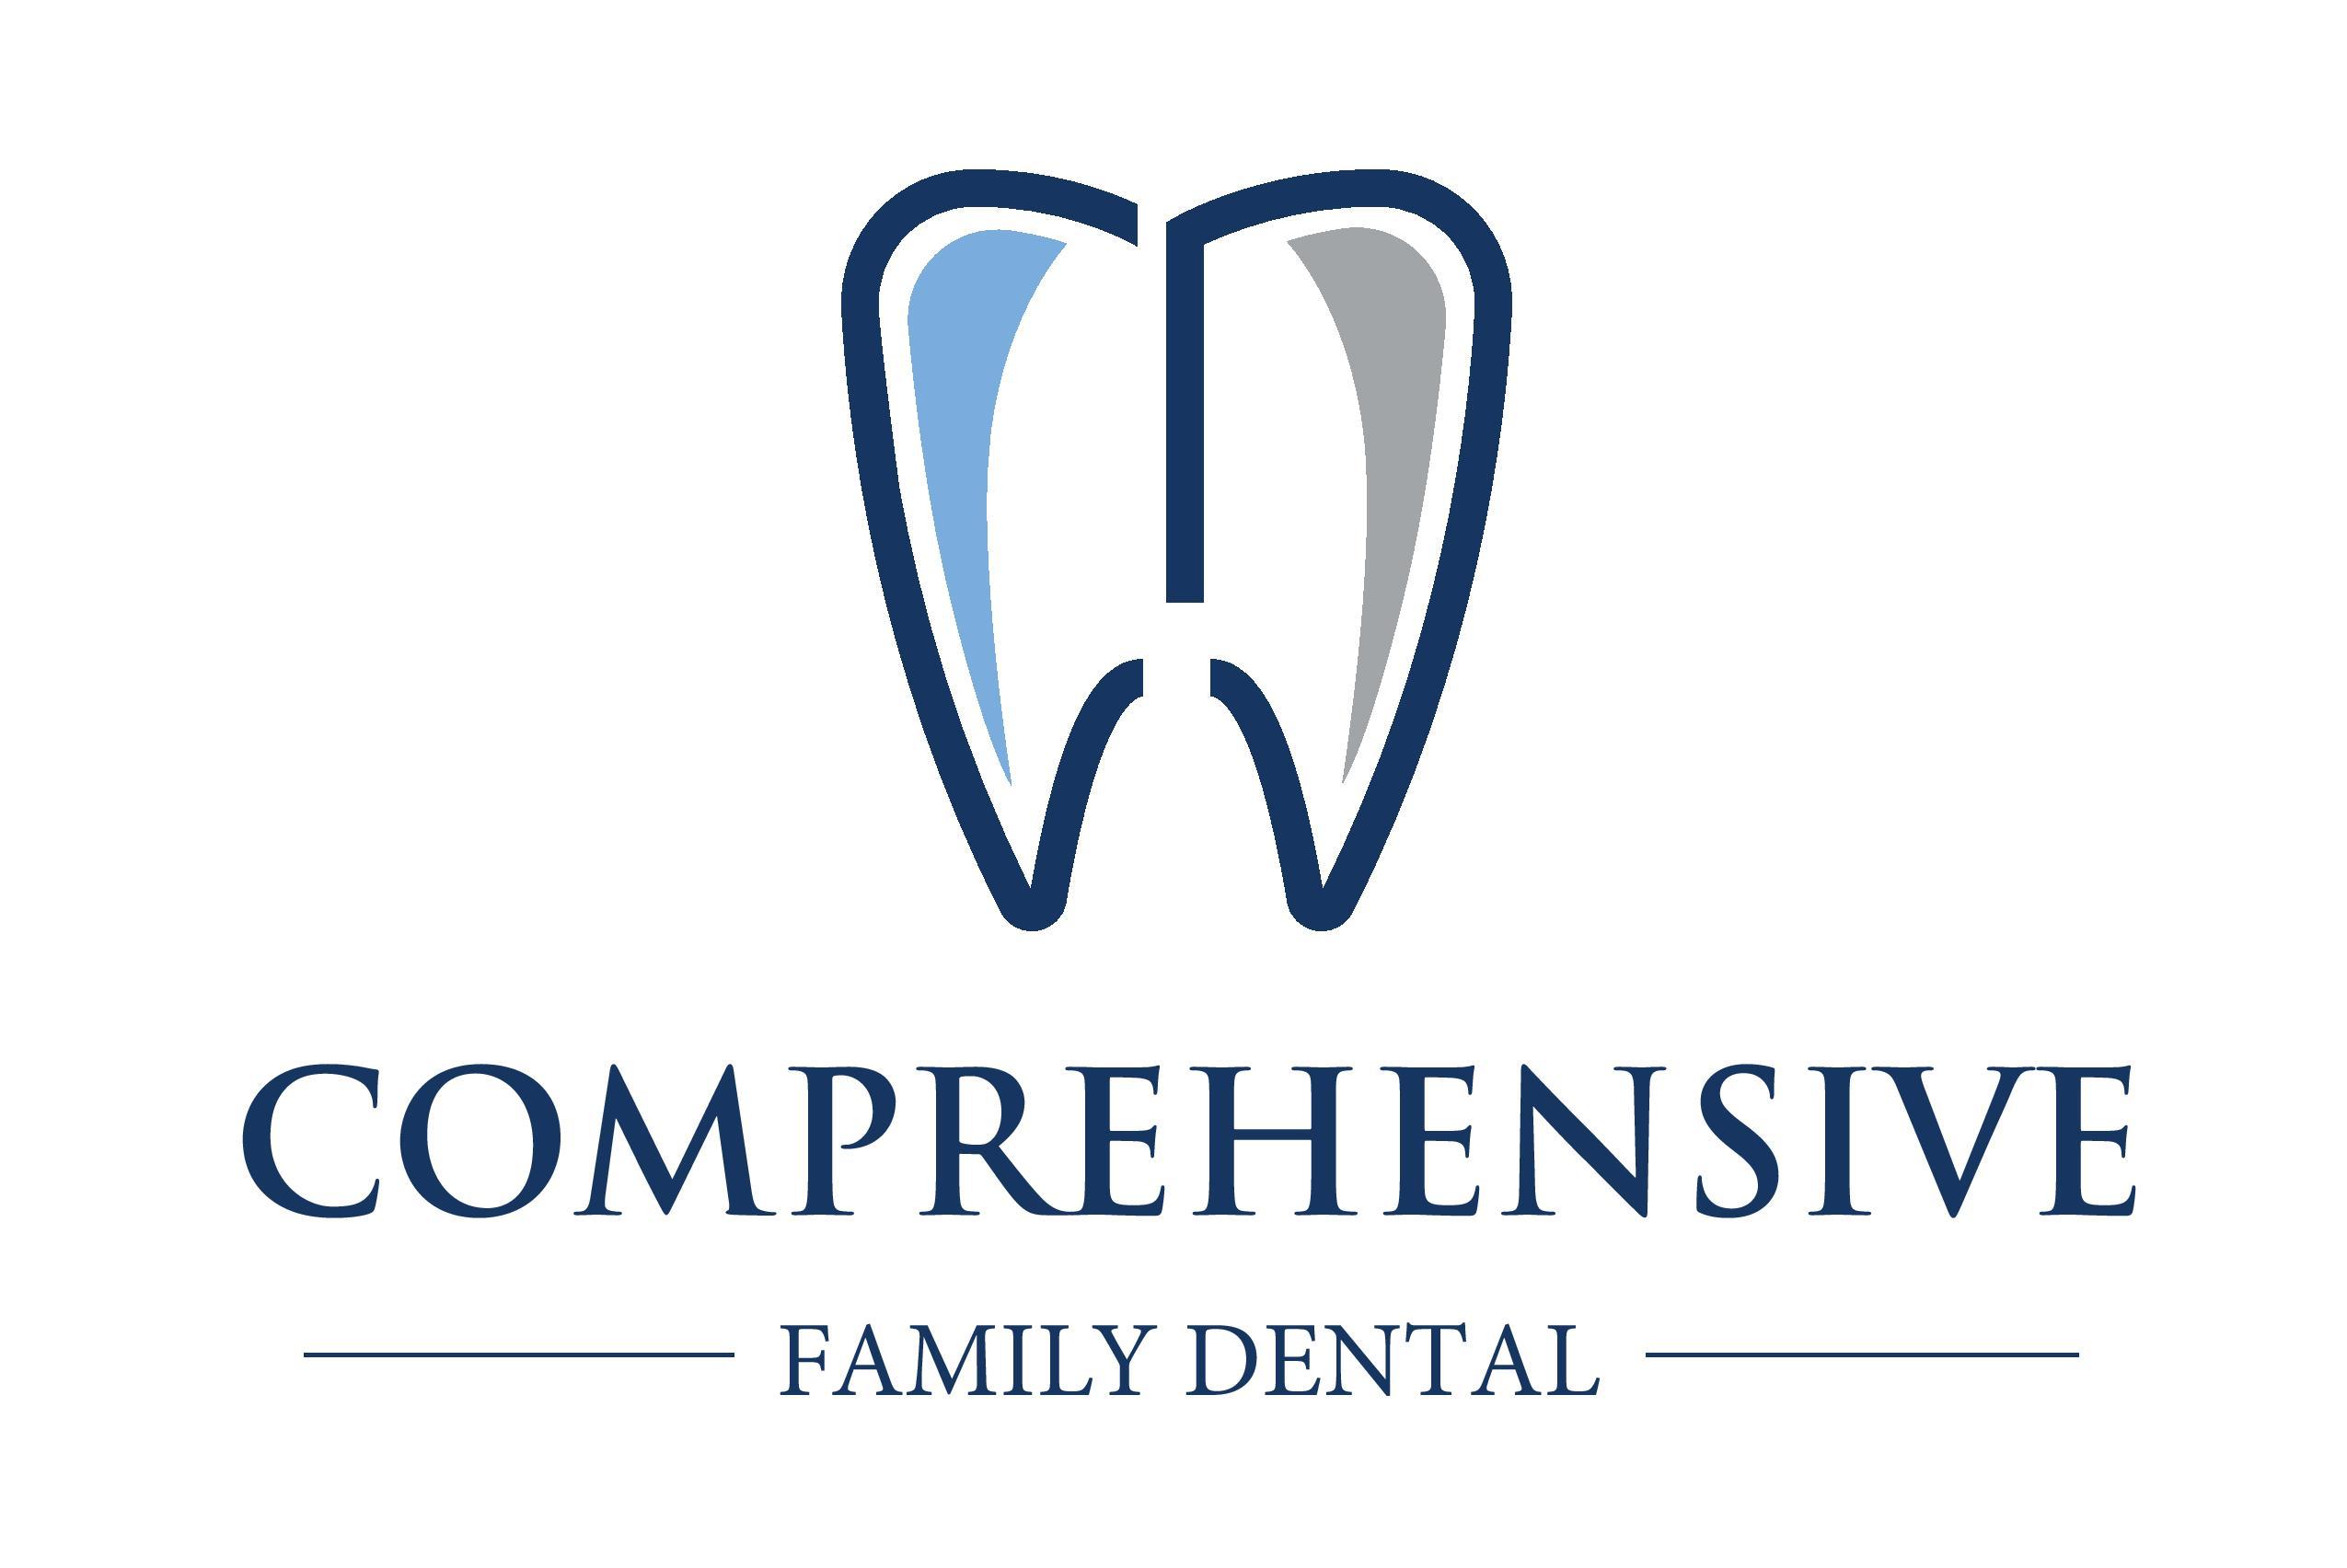 Comprehensive Family Dental logo